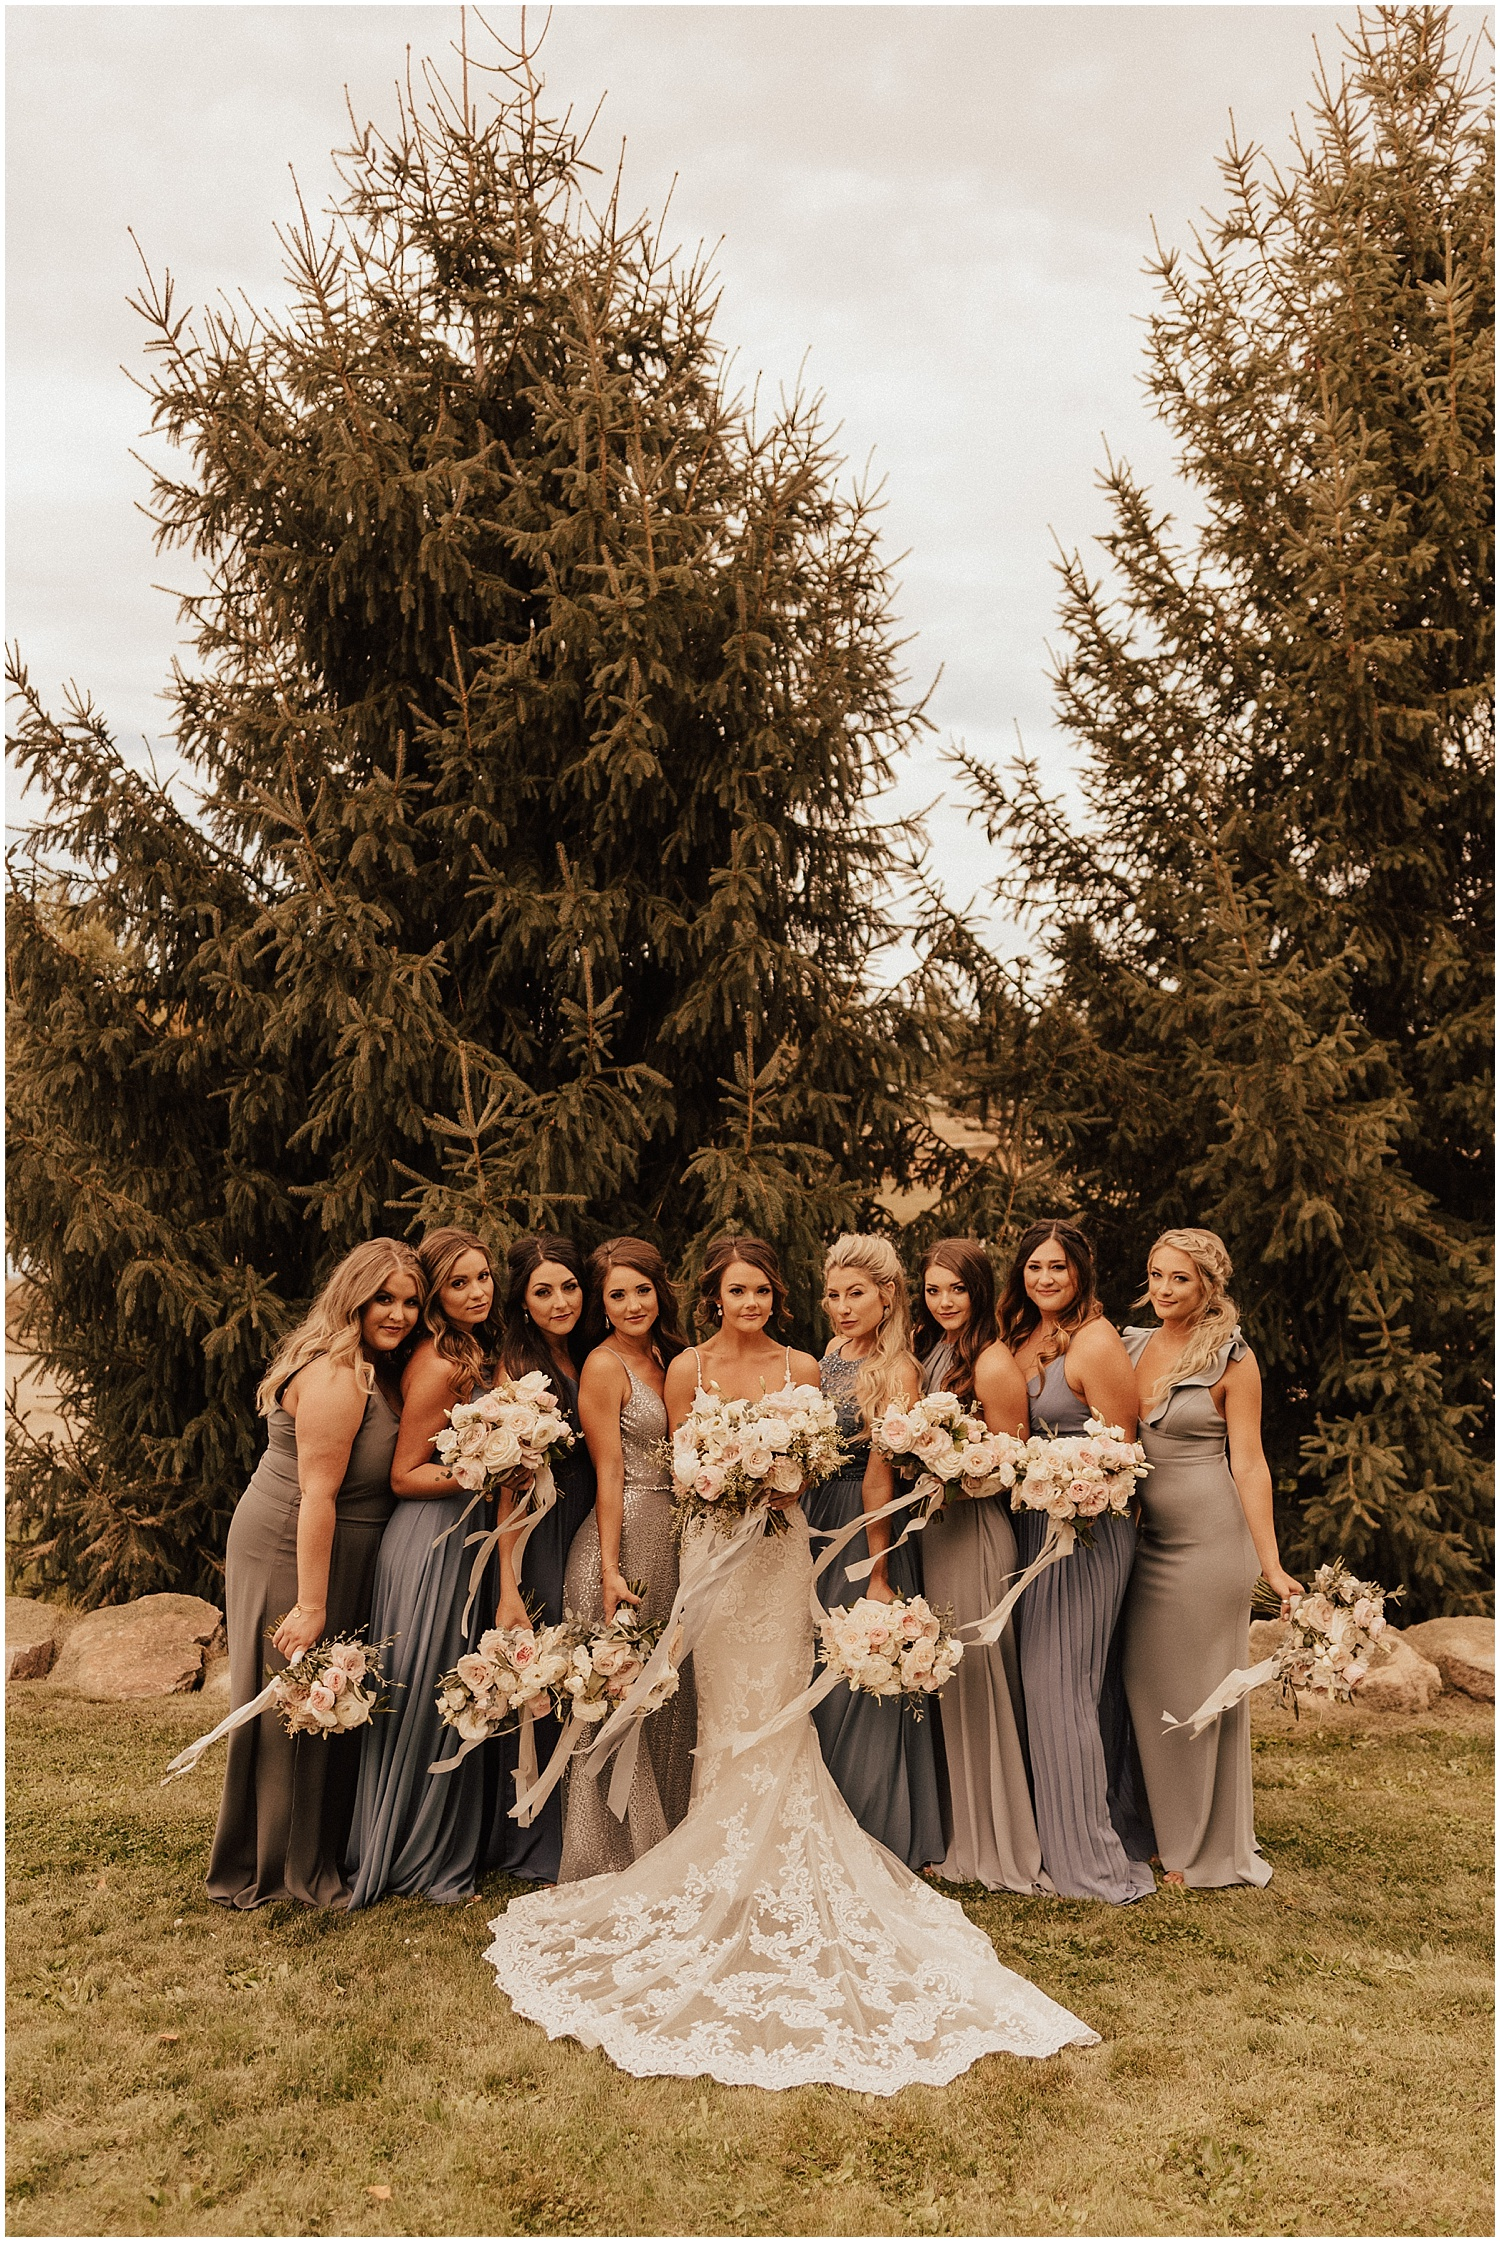 whimsical-summer-wedding-boise-idaho-las-vegas-bride84.jpg